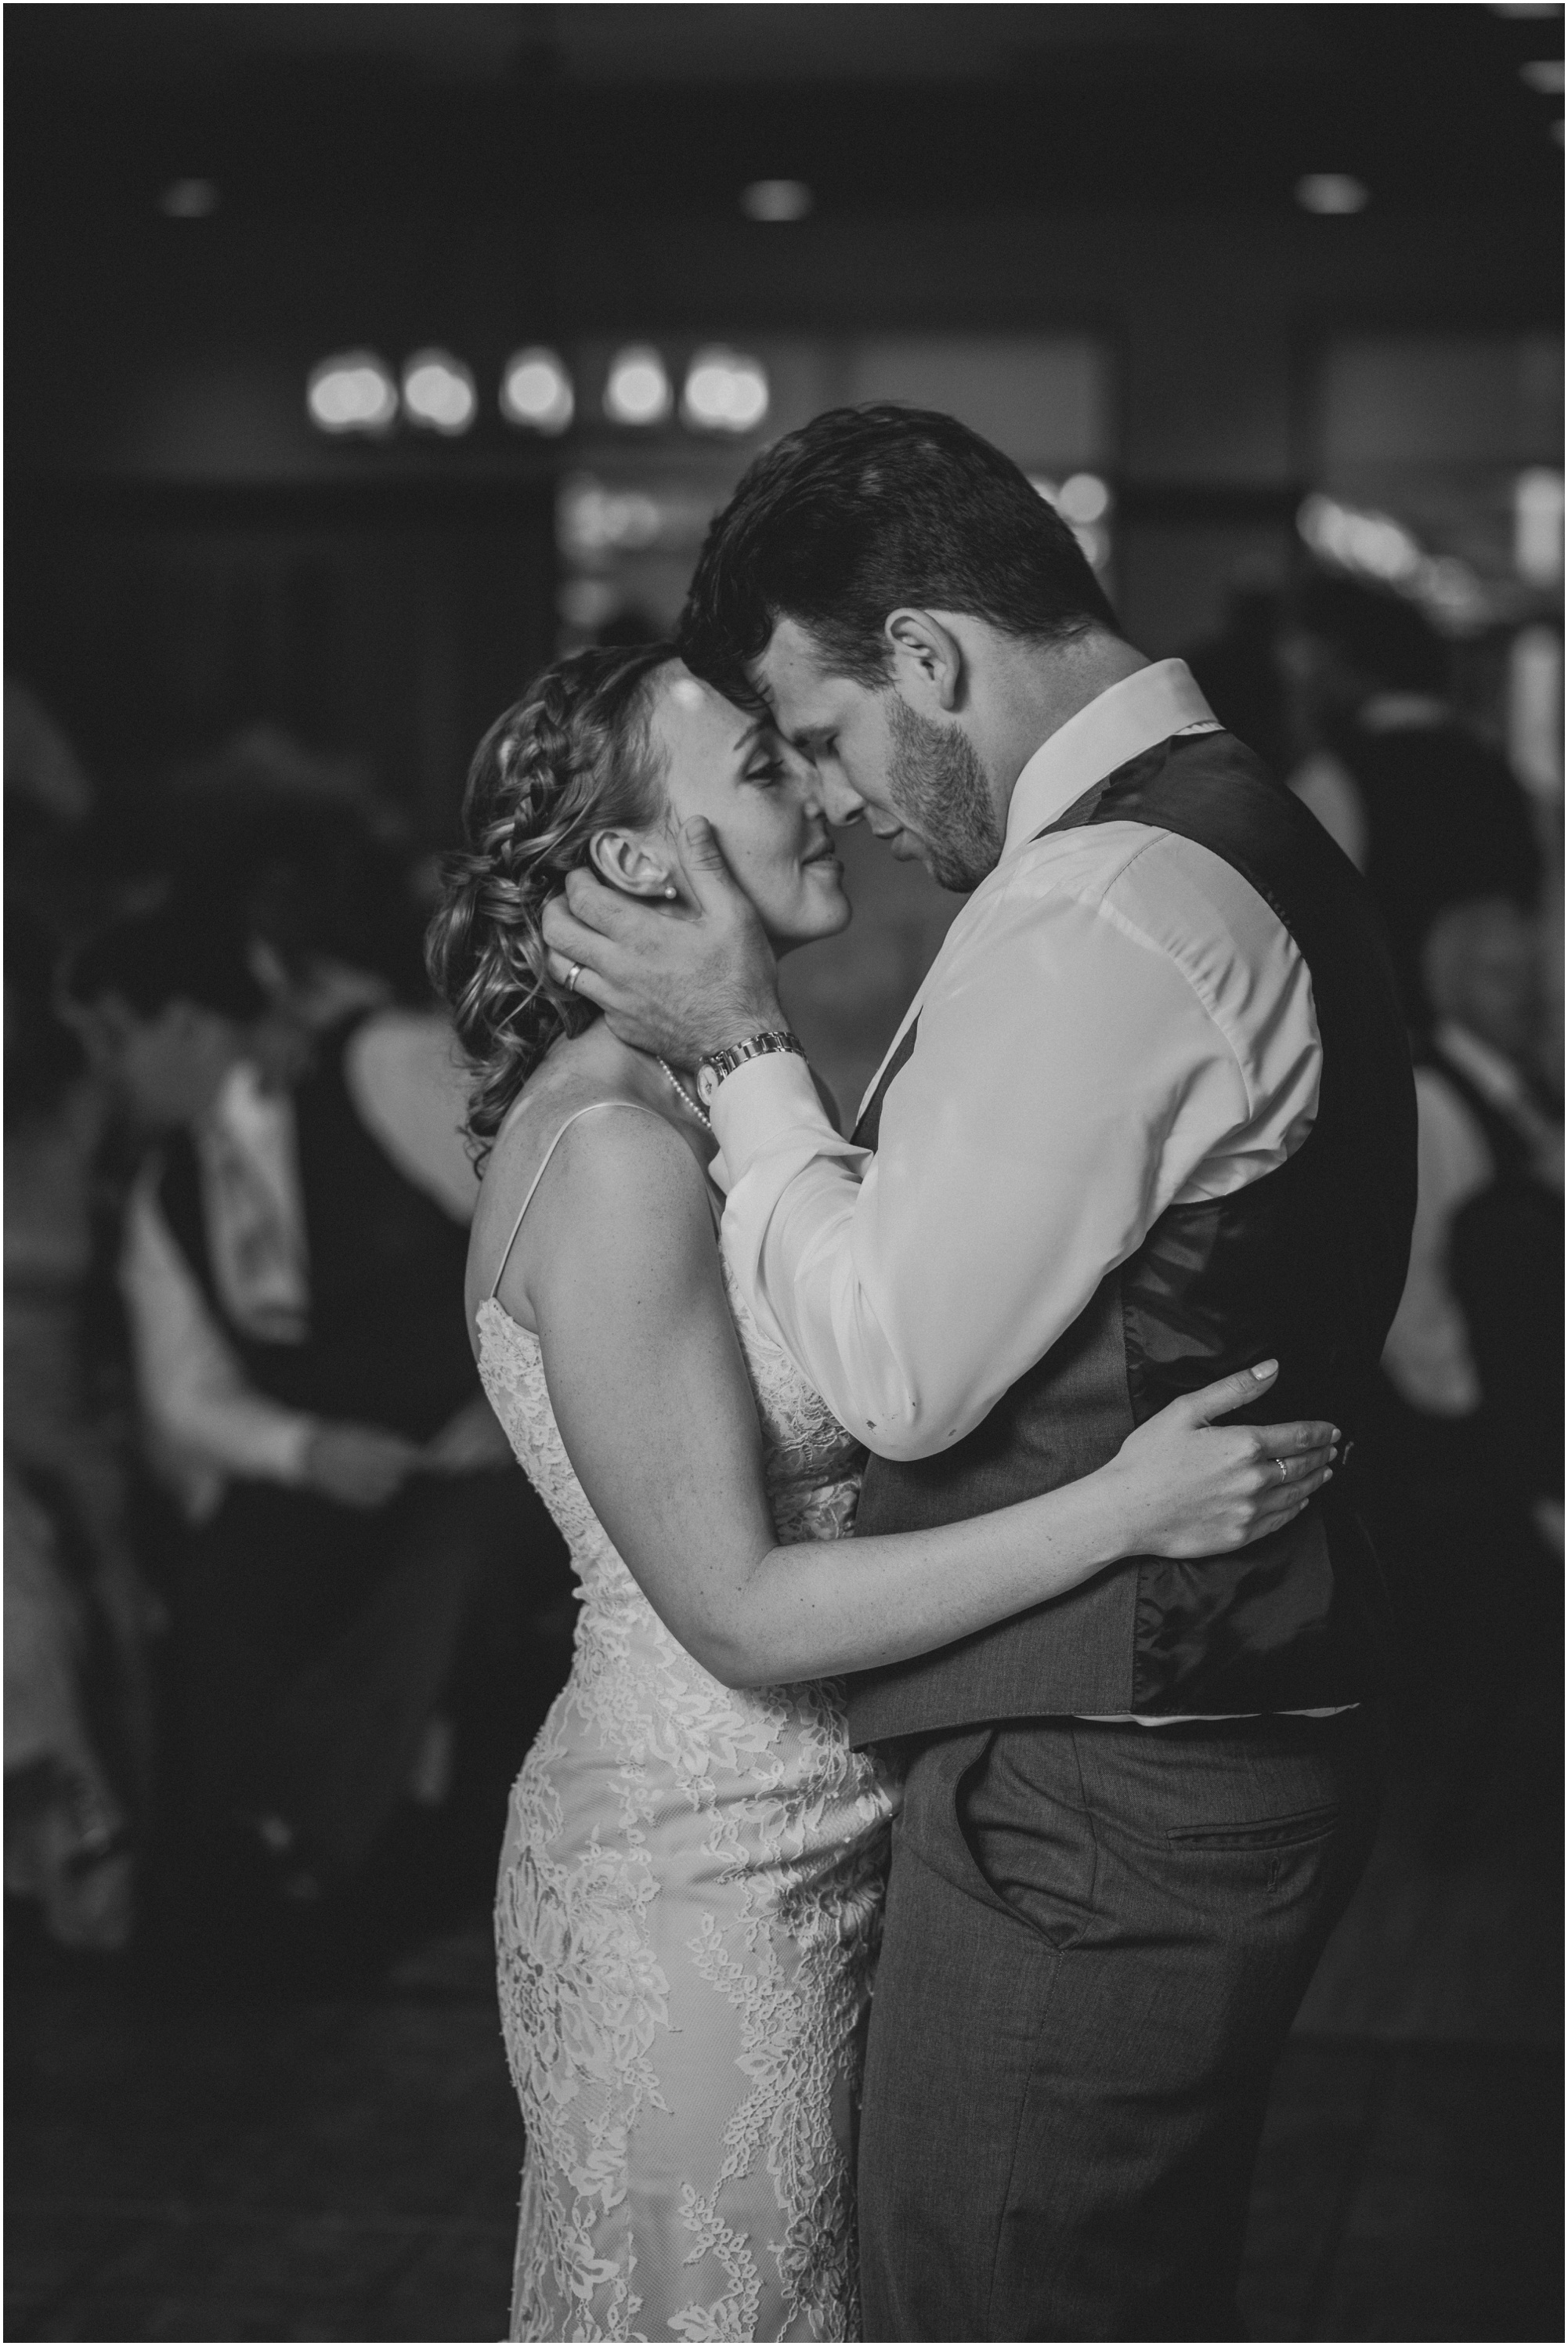 Wisconsin-Wedding-Photographer-Reedsburg-Country-Club-Kaela-and Matt-Wedding-943.jpg